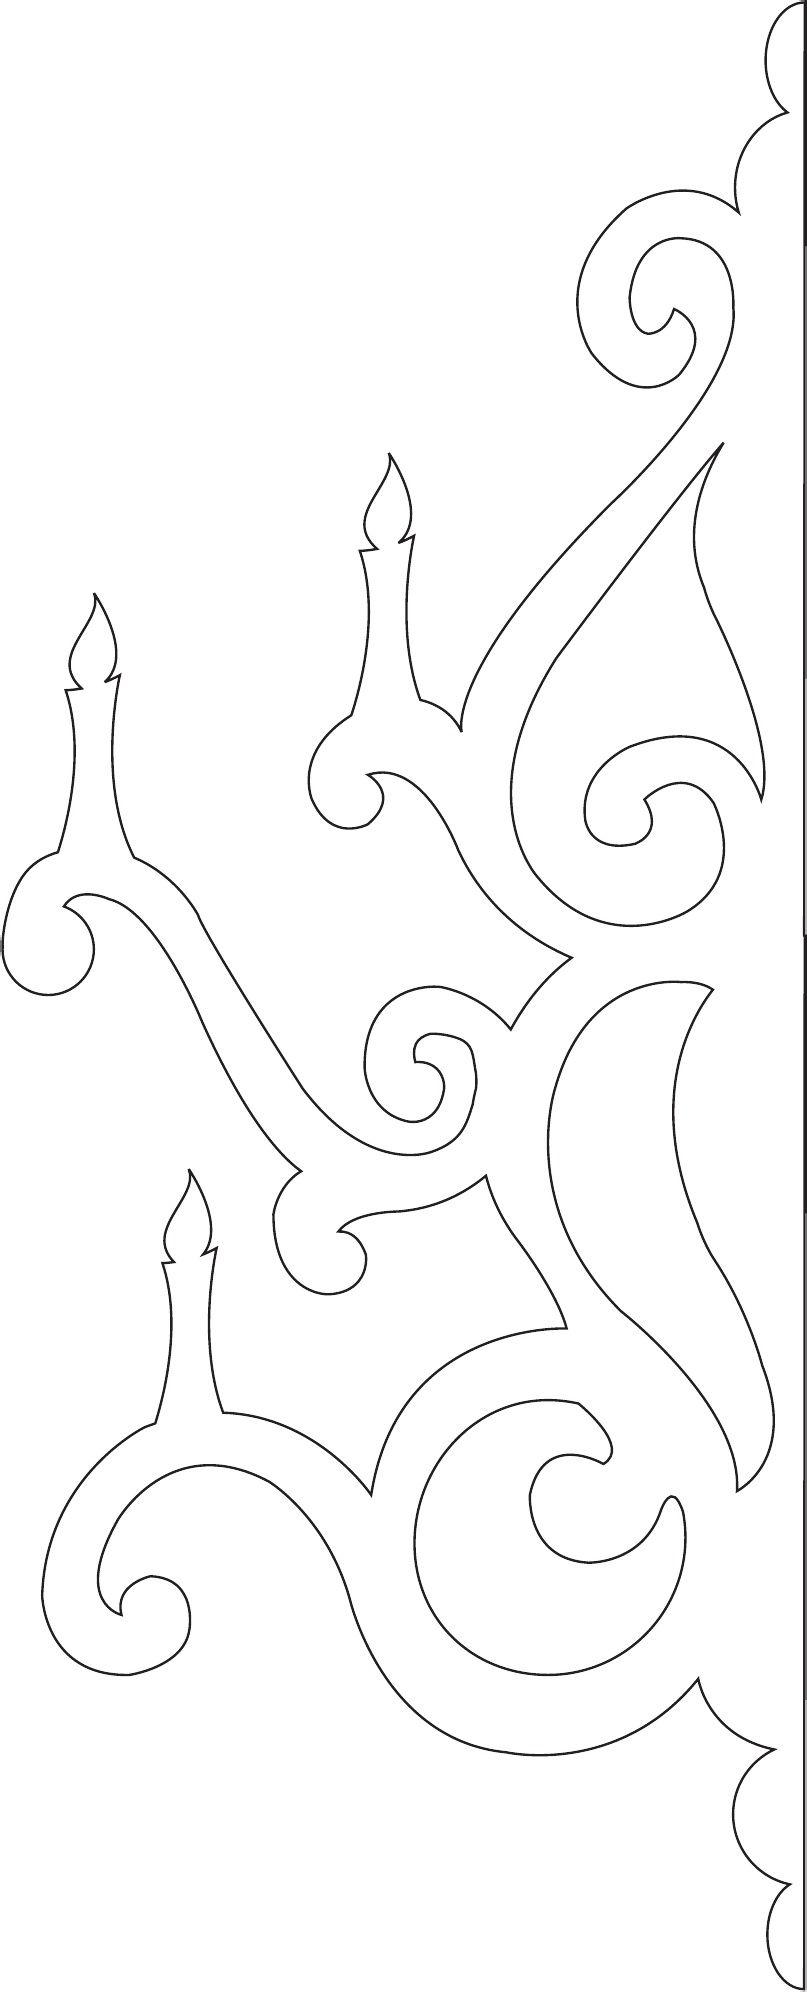 Chandelier template sablonokbortkok pinterest chandeliers chandelier template mozeypictures Choice Image